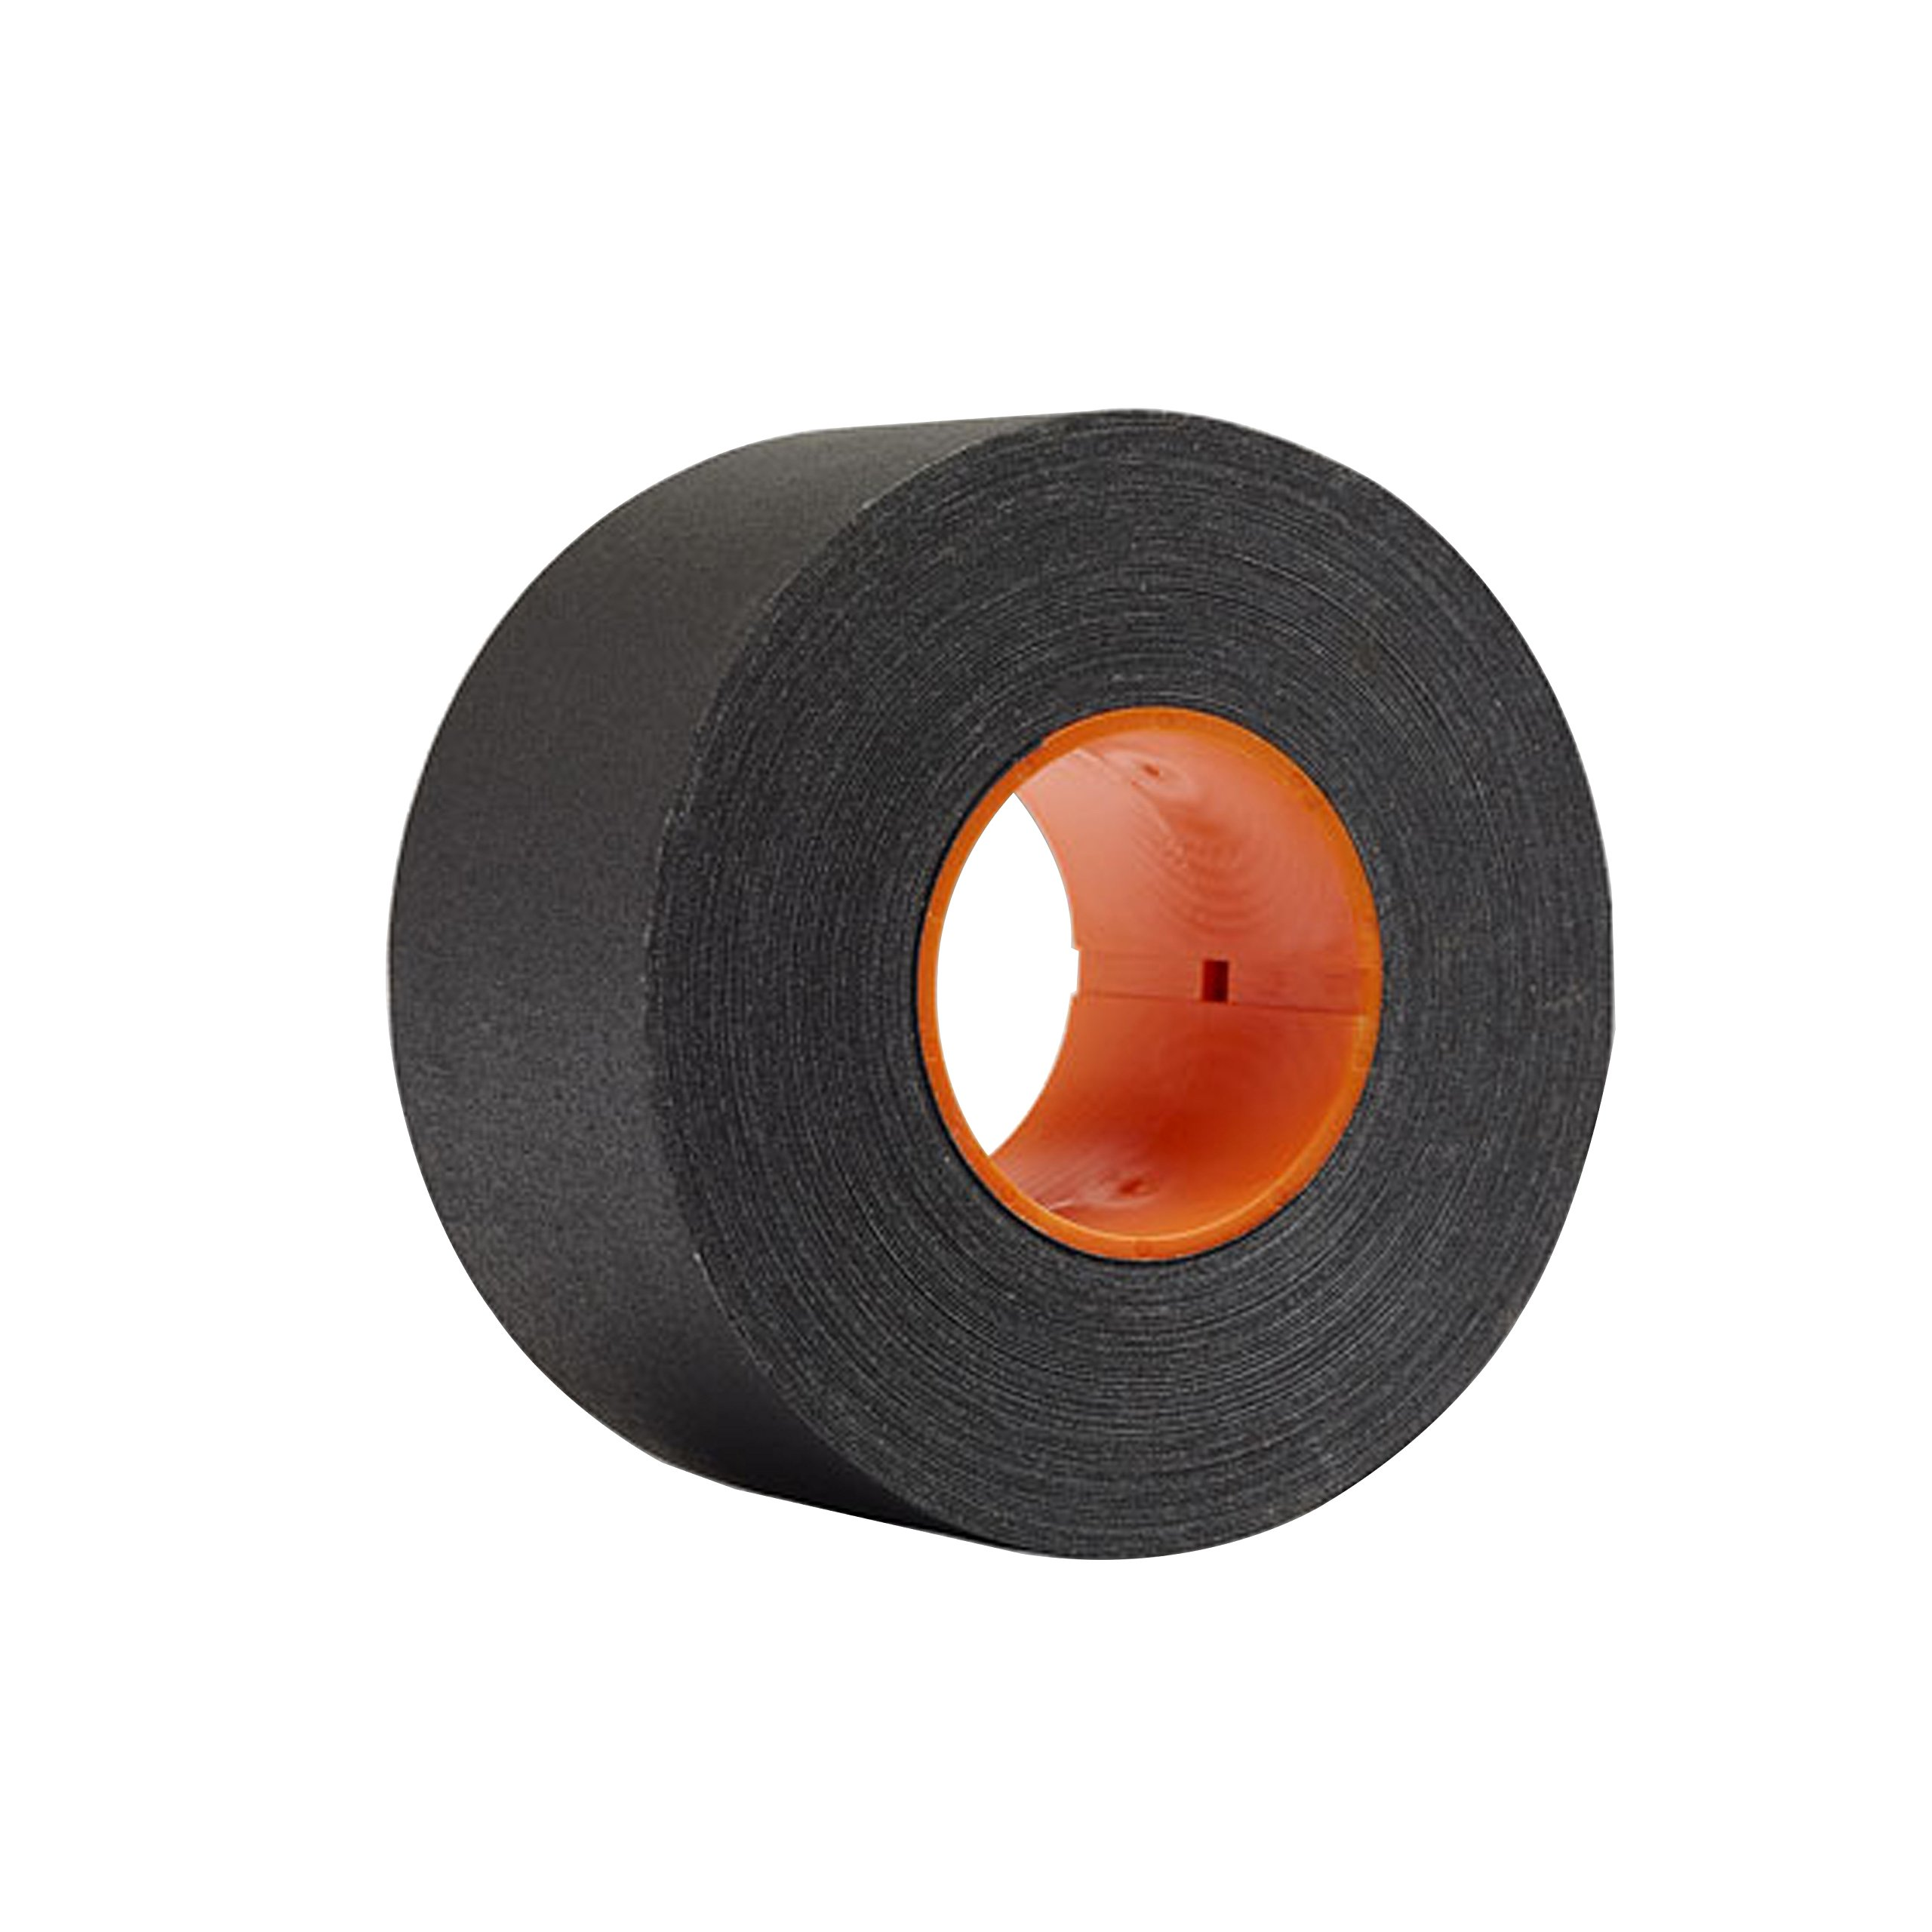 GaffTech T13BR3 GT Pro Matte Cloth Black Tape Roll, 3 Inch